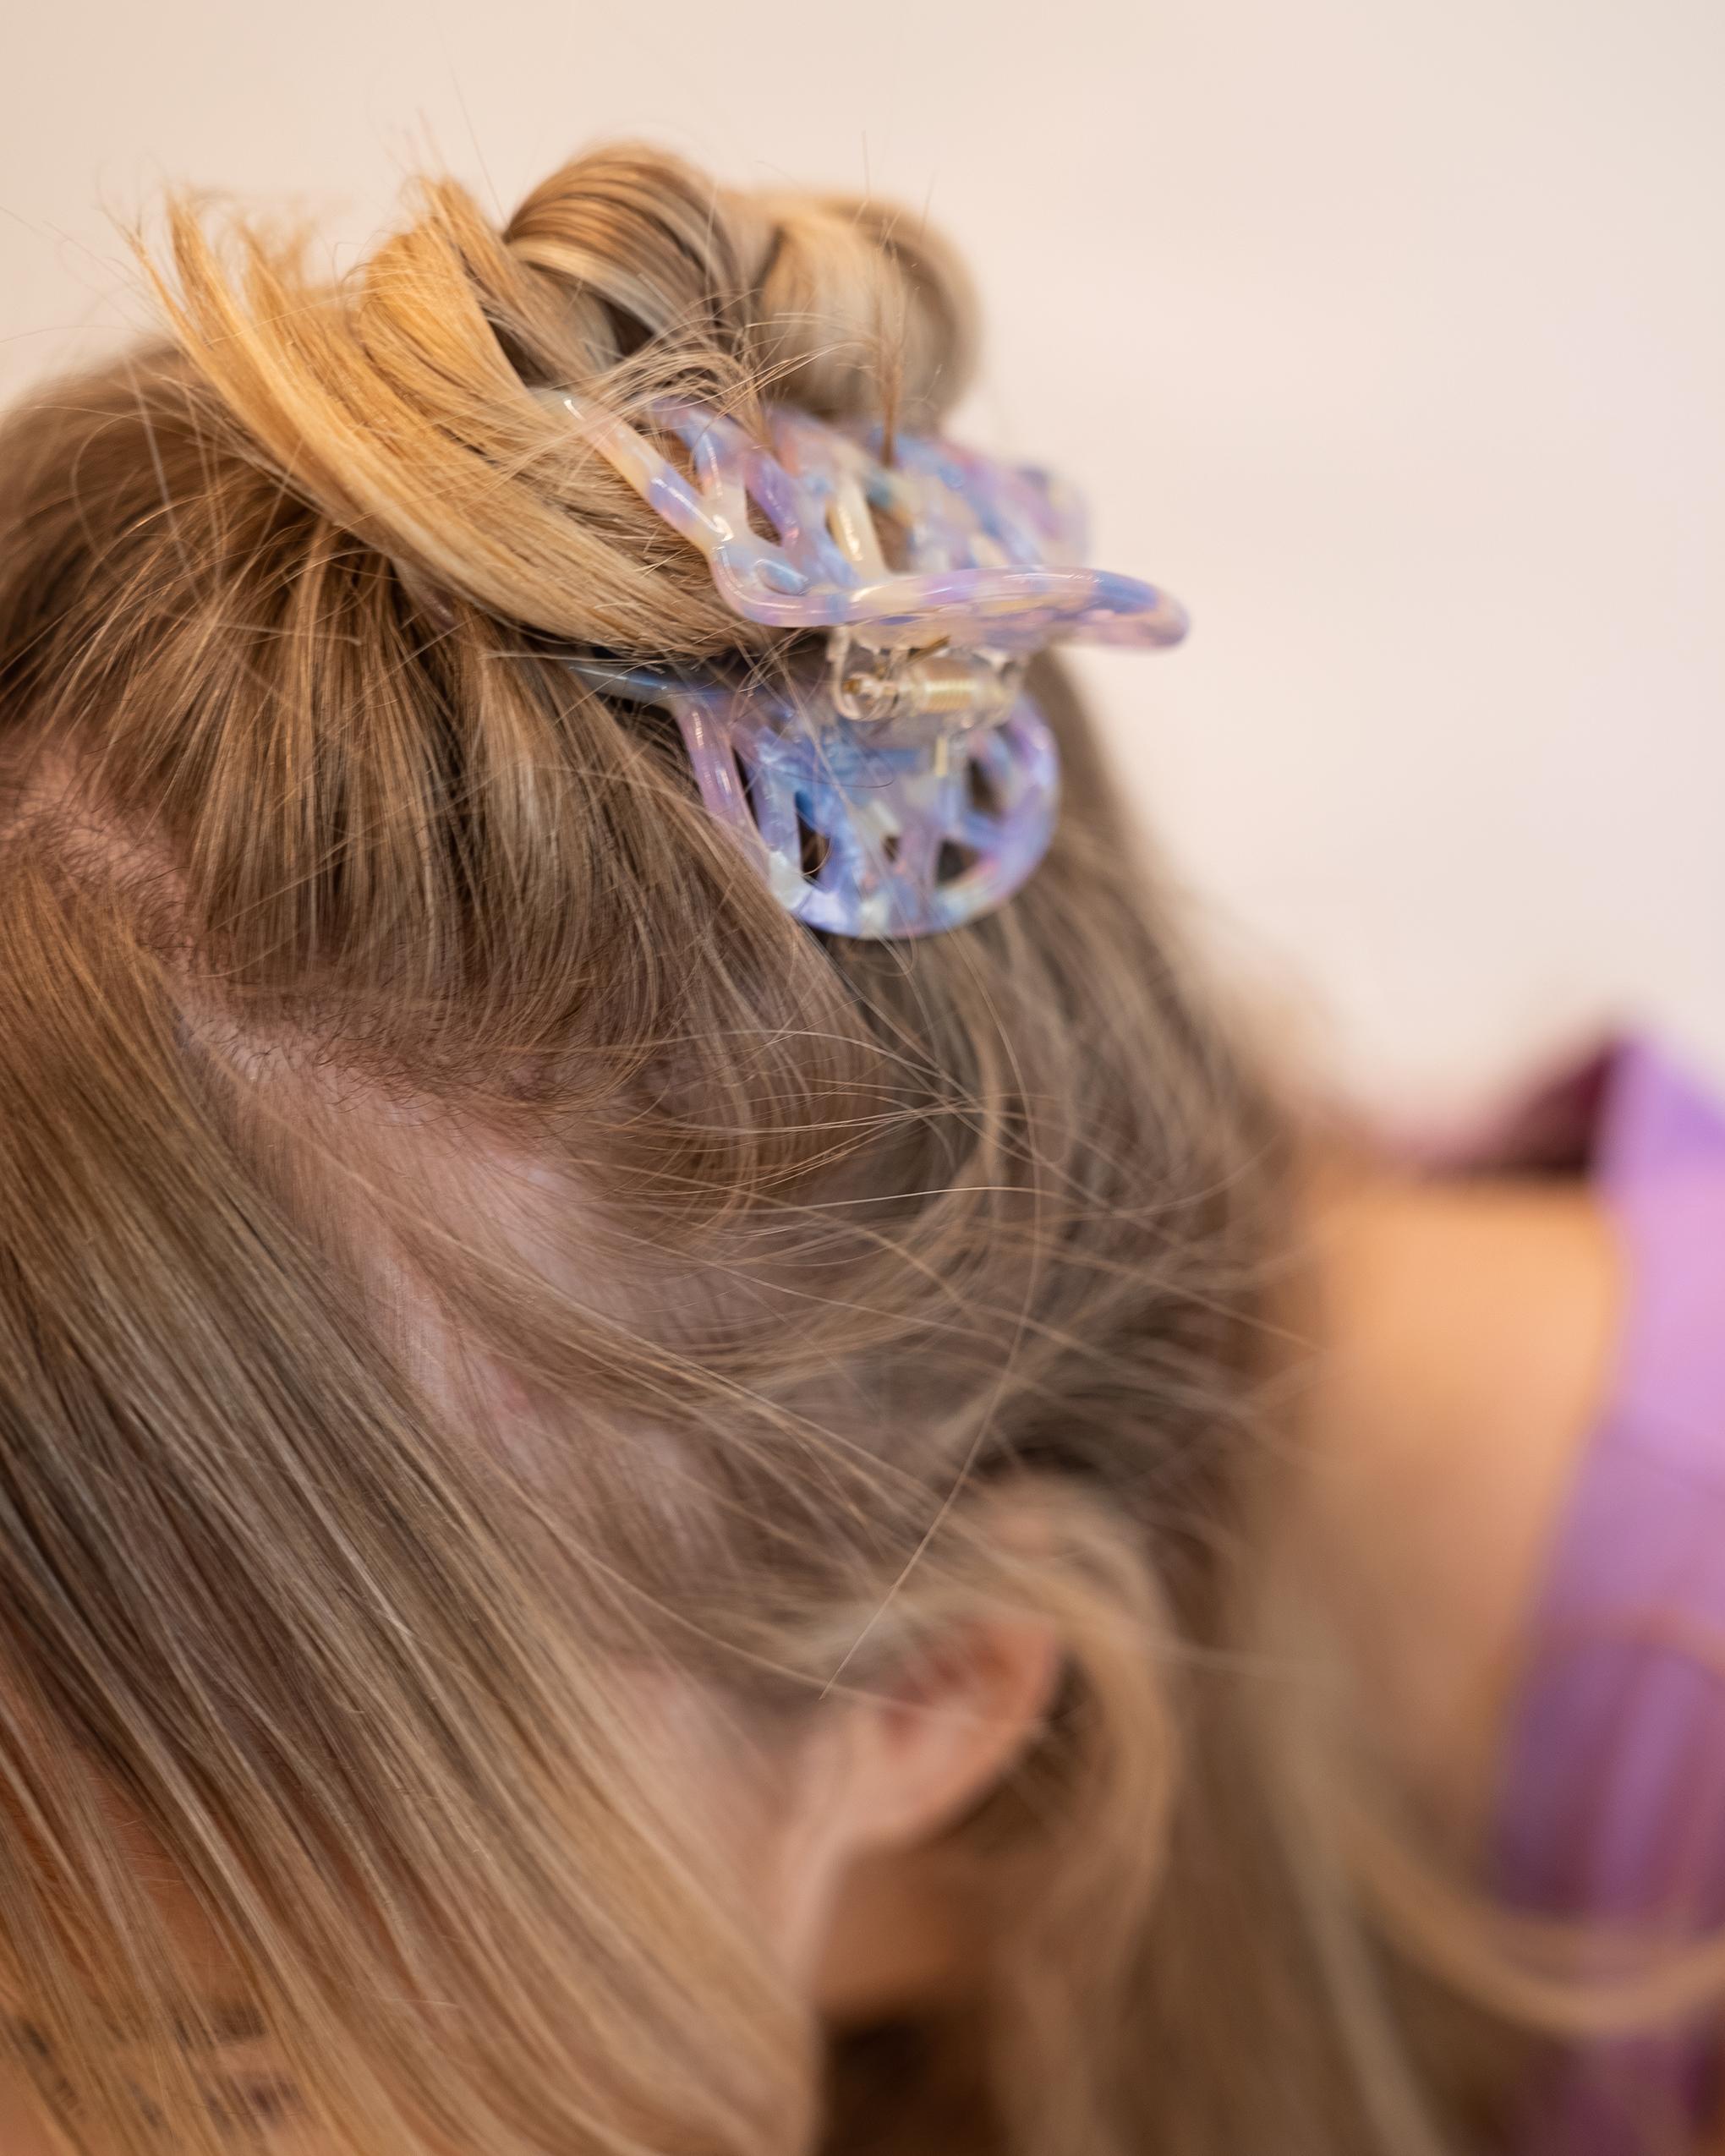 Model wearing Emin + Paul parma violet lattice hair claw.